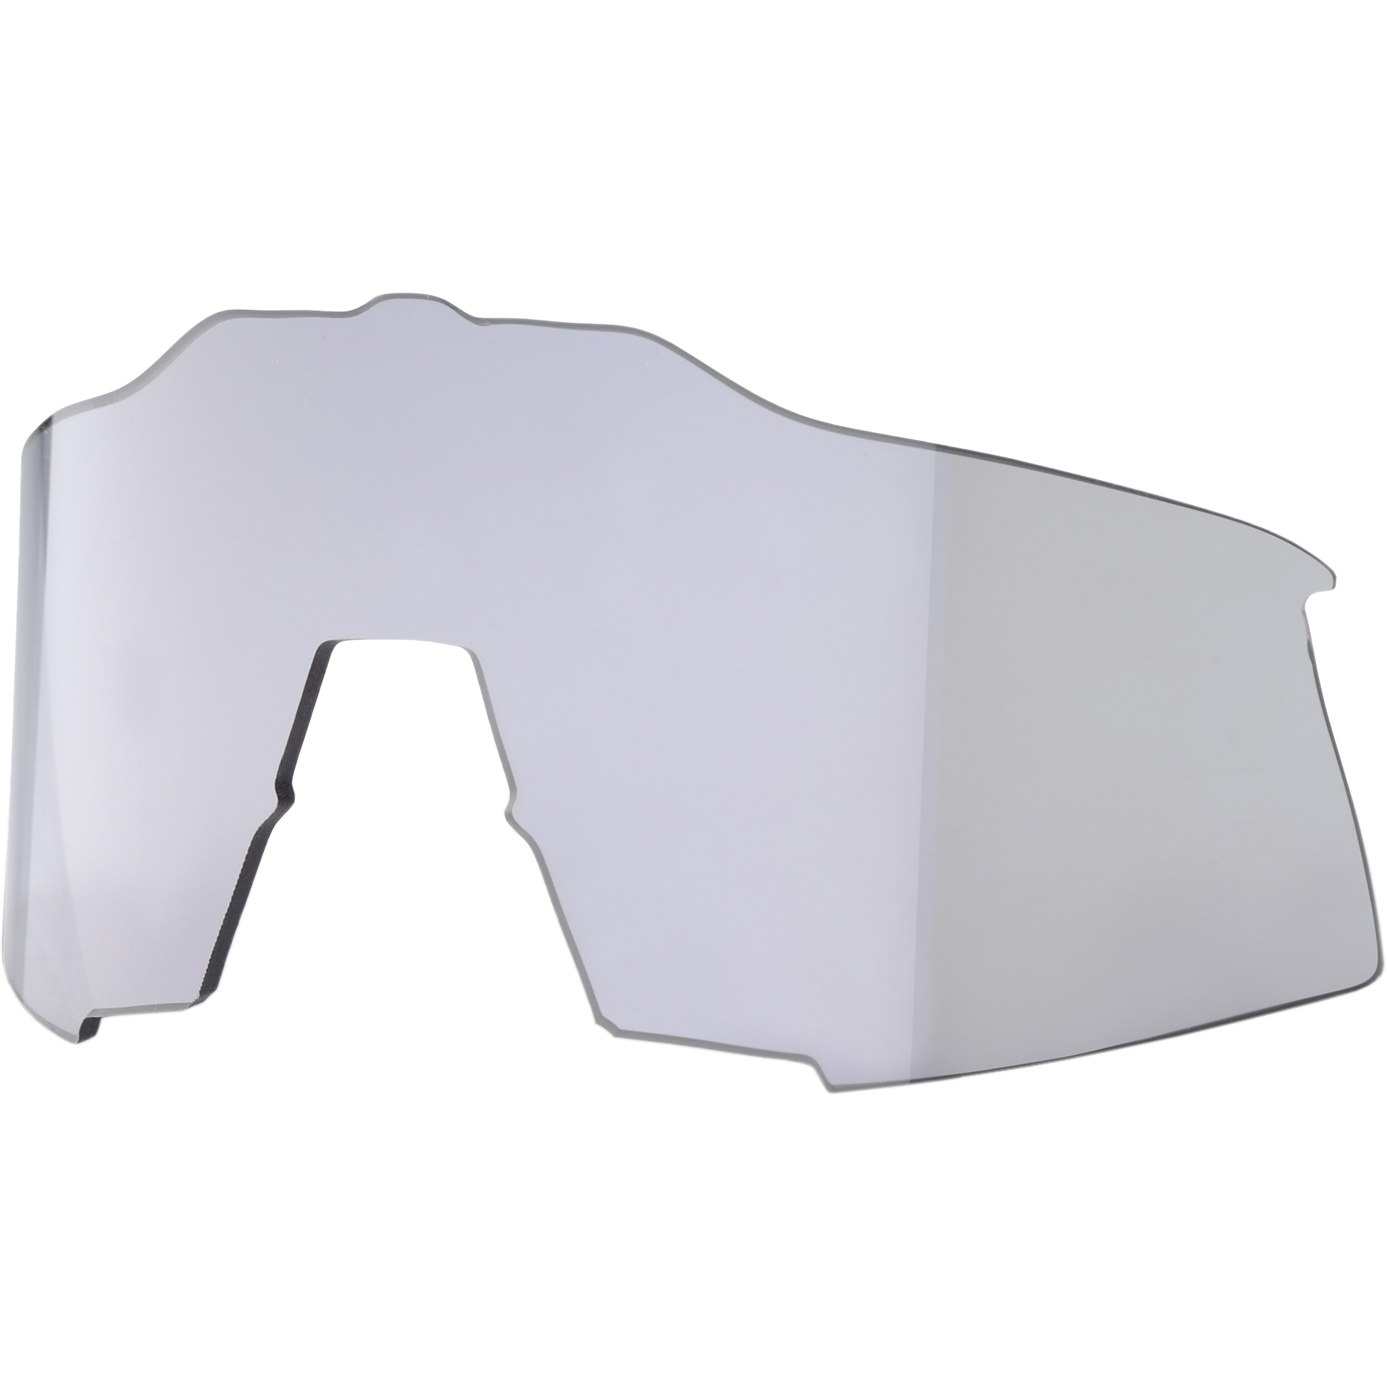 100% Speedcraft Tall HiPER Mirror Lente de repuesto - HiPER Silver Mirror